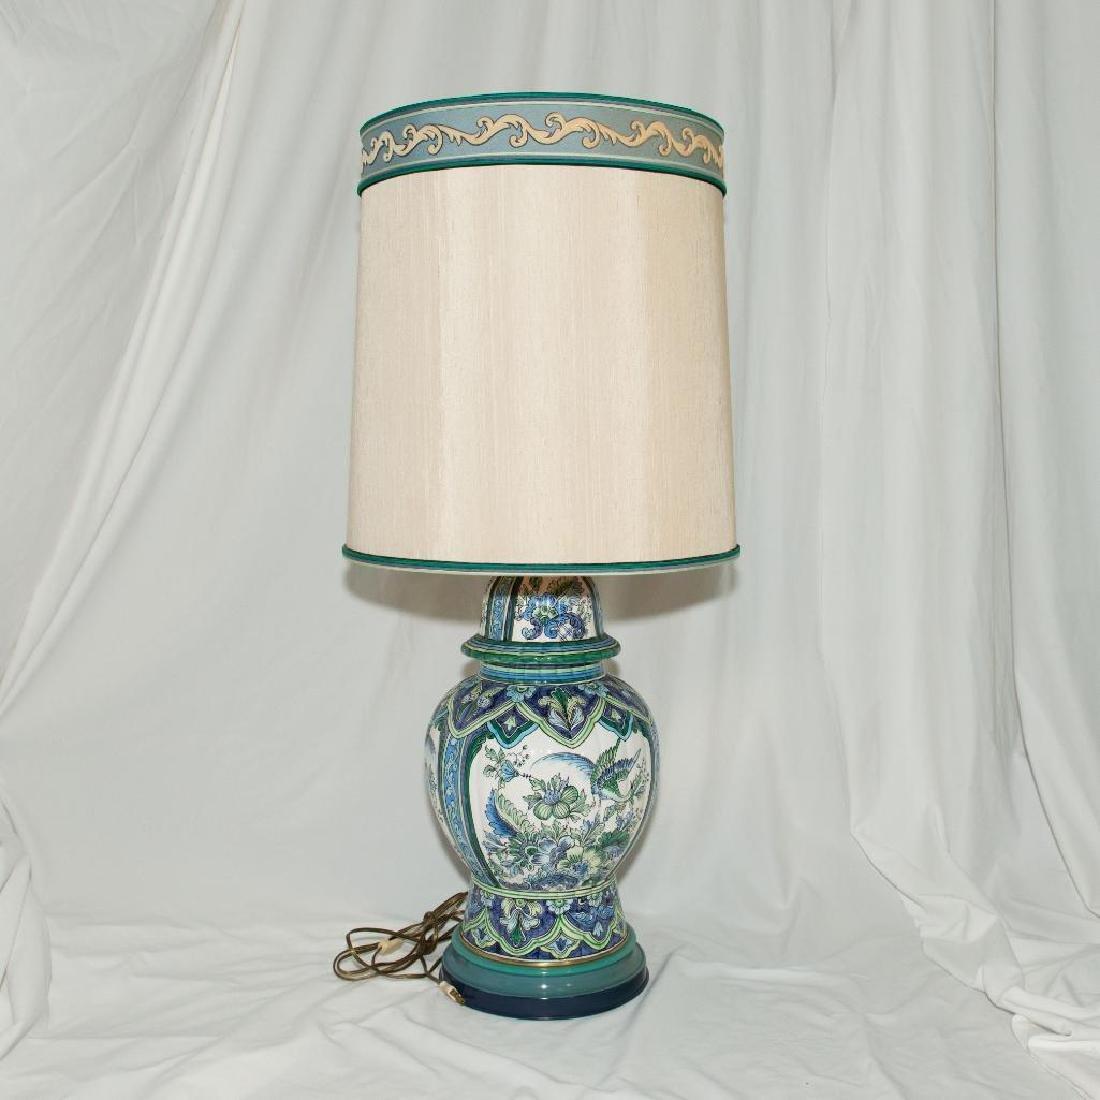 VINTAGE MARBRO CERAMIC TIN BRASS DUAL BULB DESK LAMP